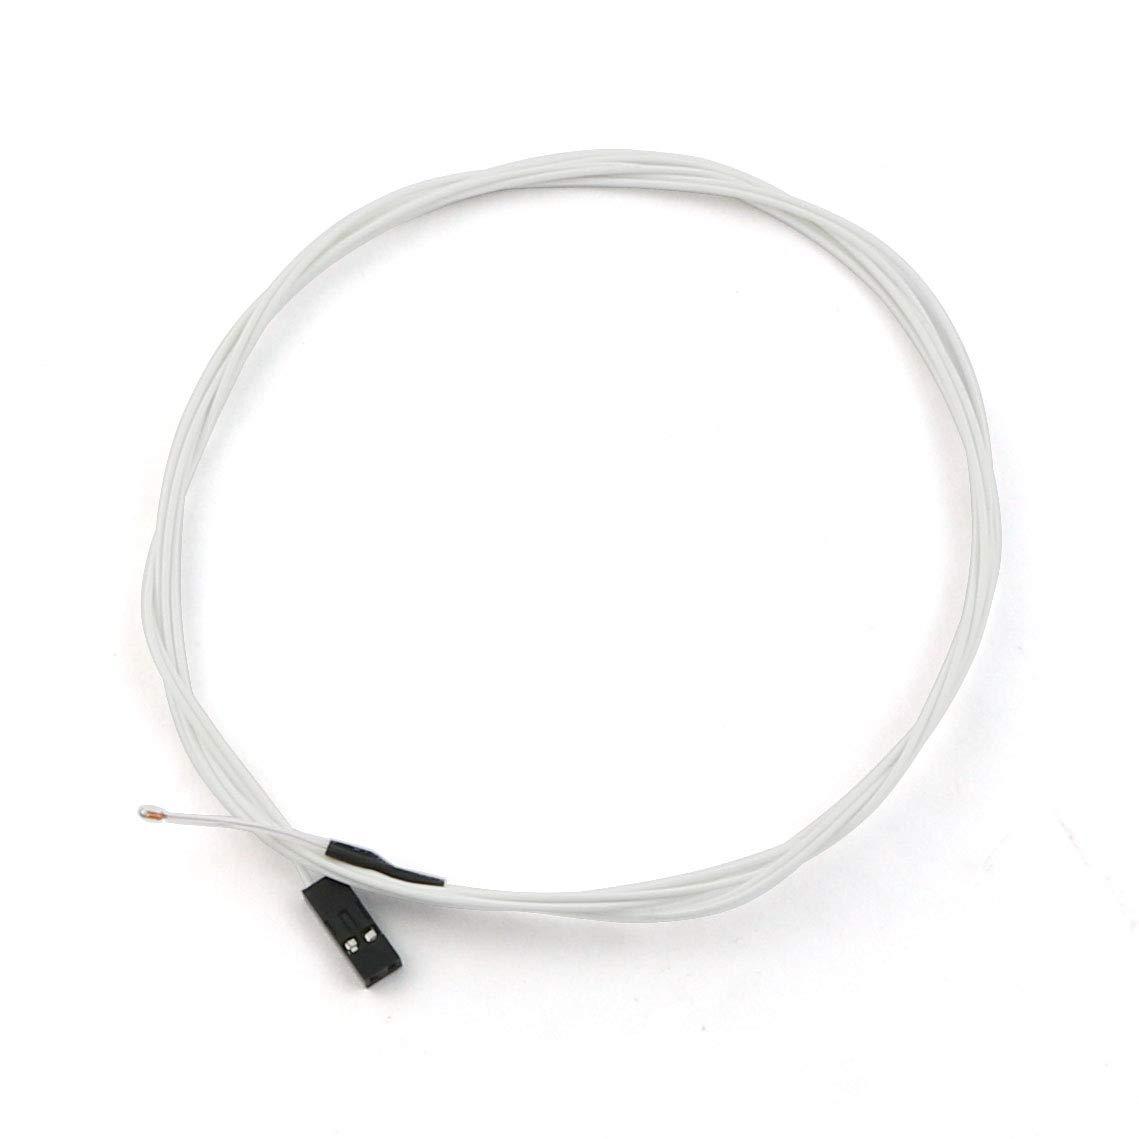 RLECS 5-Pack 3D Printer Thermistors Temperature Sensor NTC 3950 100K with 1M Cable /& 2Pin Head Connector for RepRap 3D Printers Heatbed Hot End Mendel Prusa J-Head